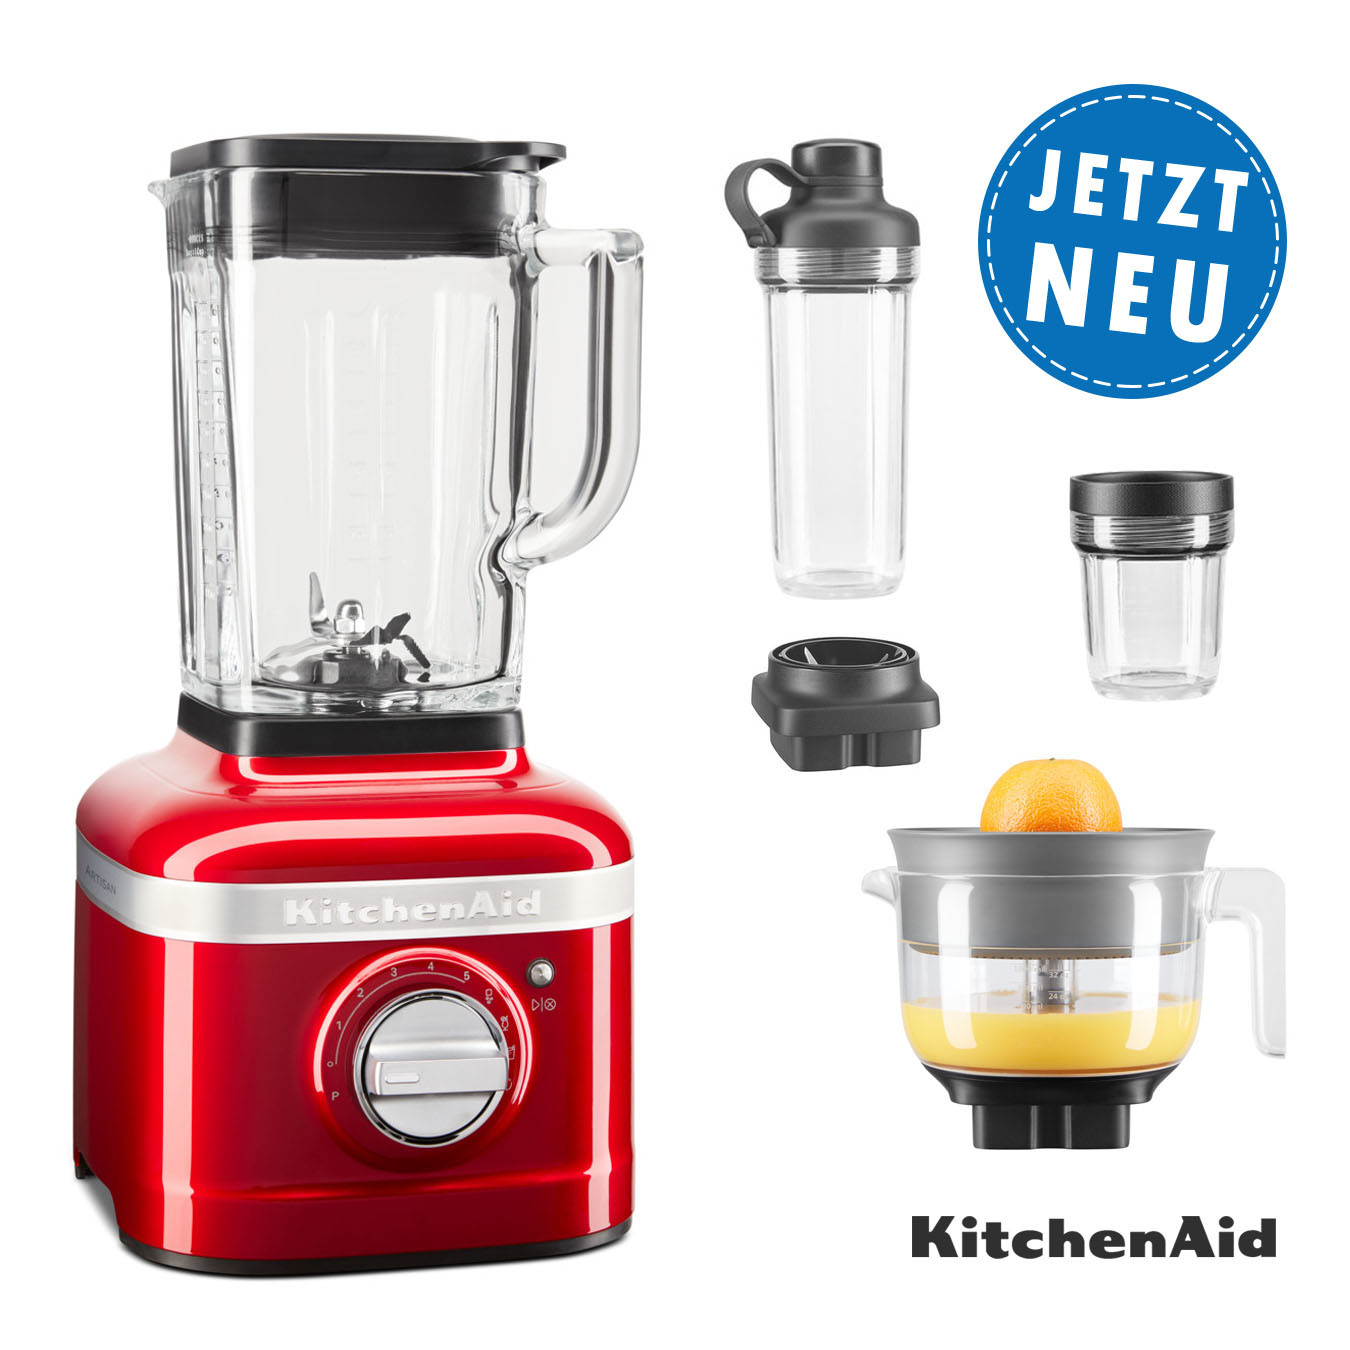 KitchenAid ARTISAN K400 Standmixer 5KSB4026ECA liebesapofelrot